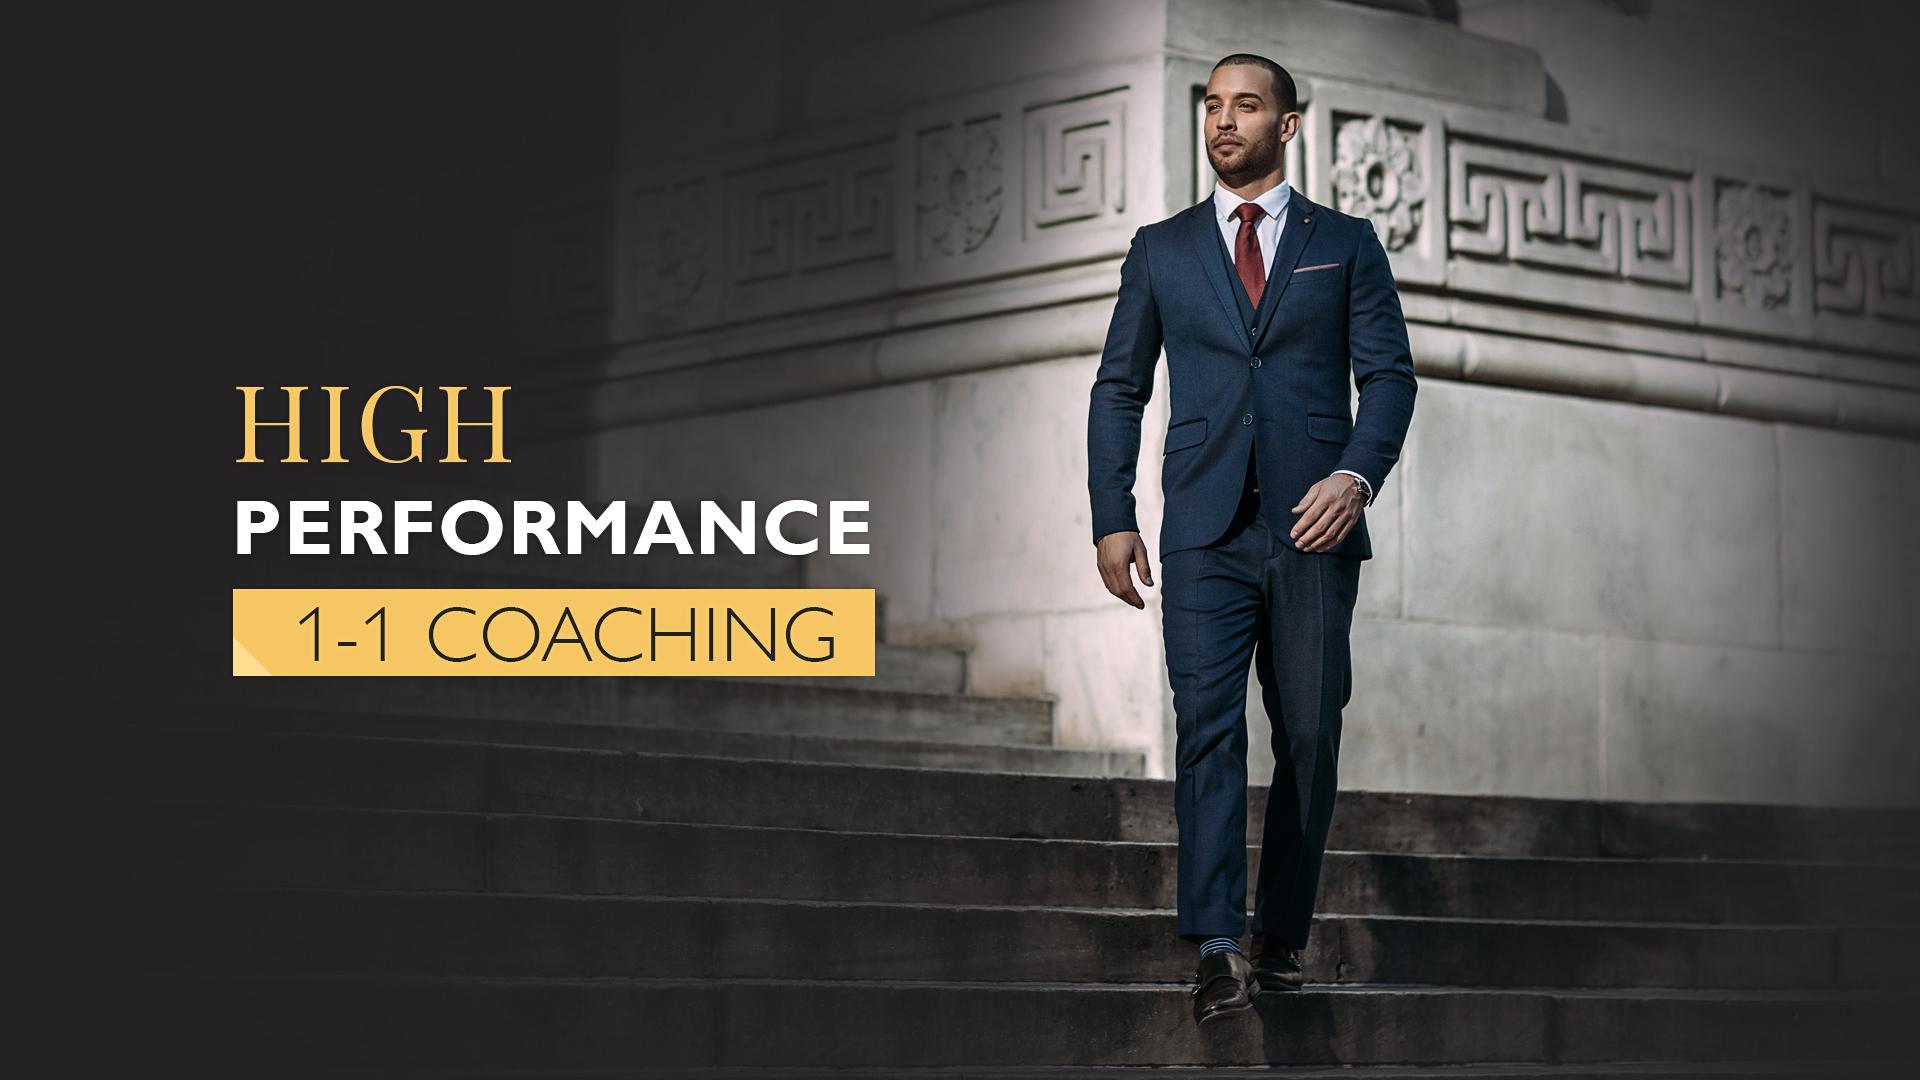 1-1 high performance coaching